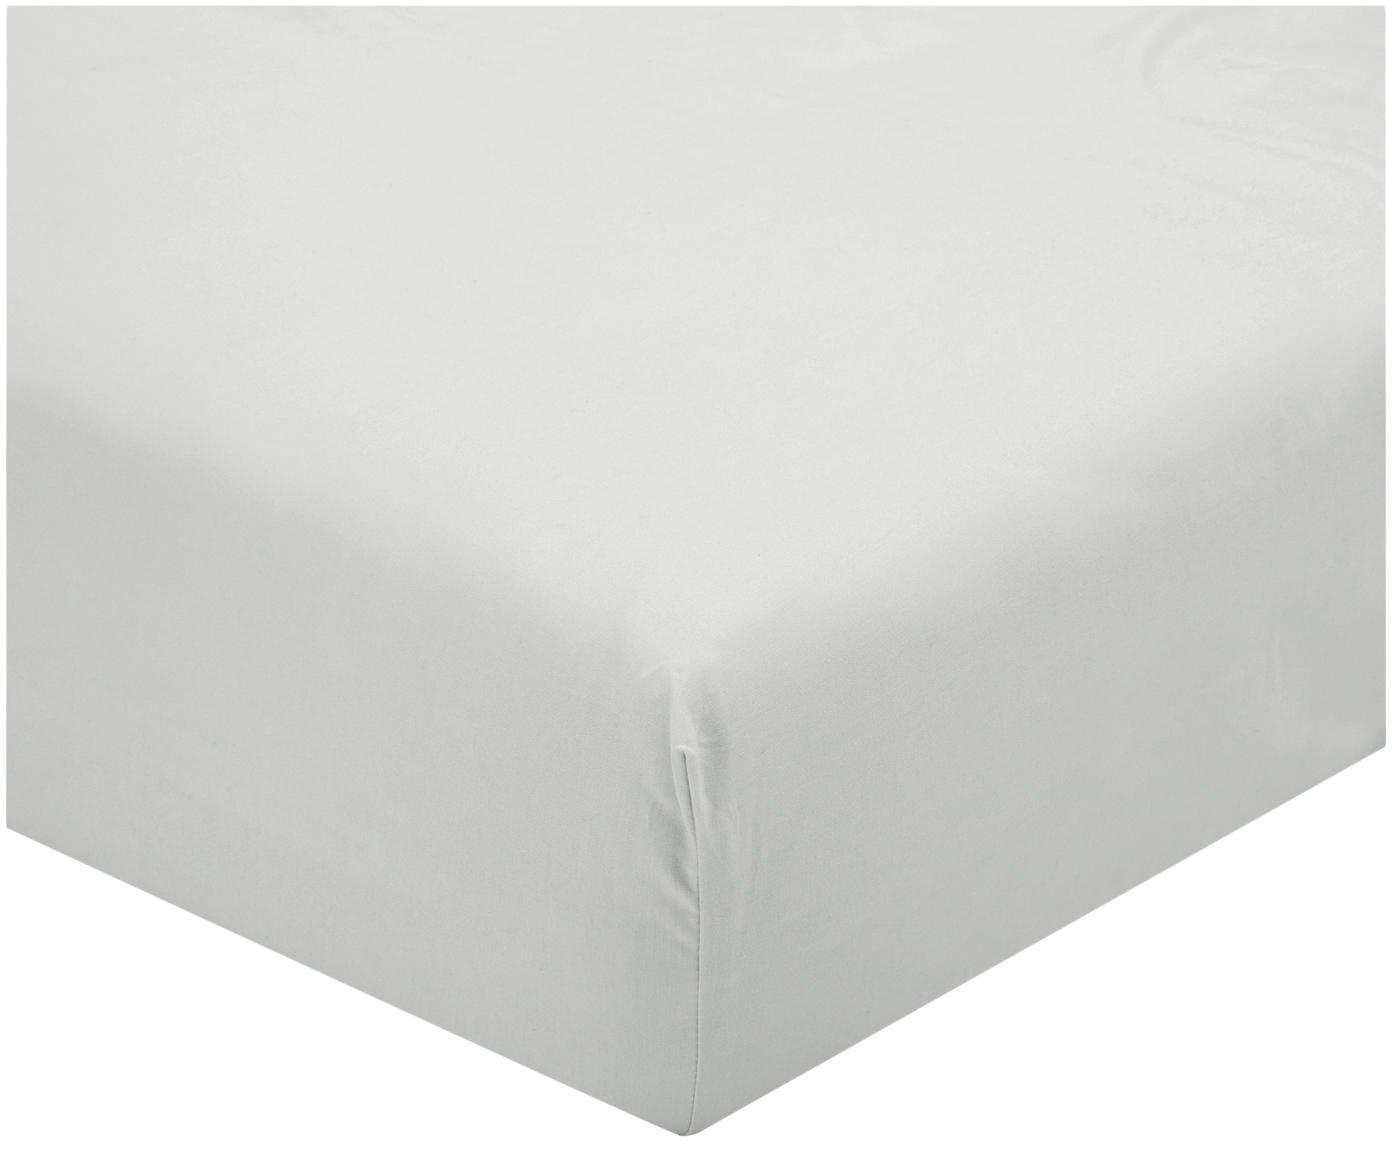 Lenzuolo con angoli in percalle Elsie, Tessuto: percalle, Grigio chiaro, 90 x 200 cm